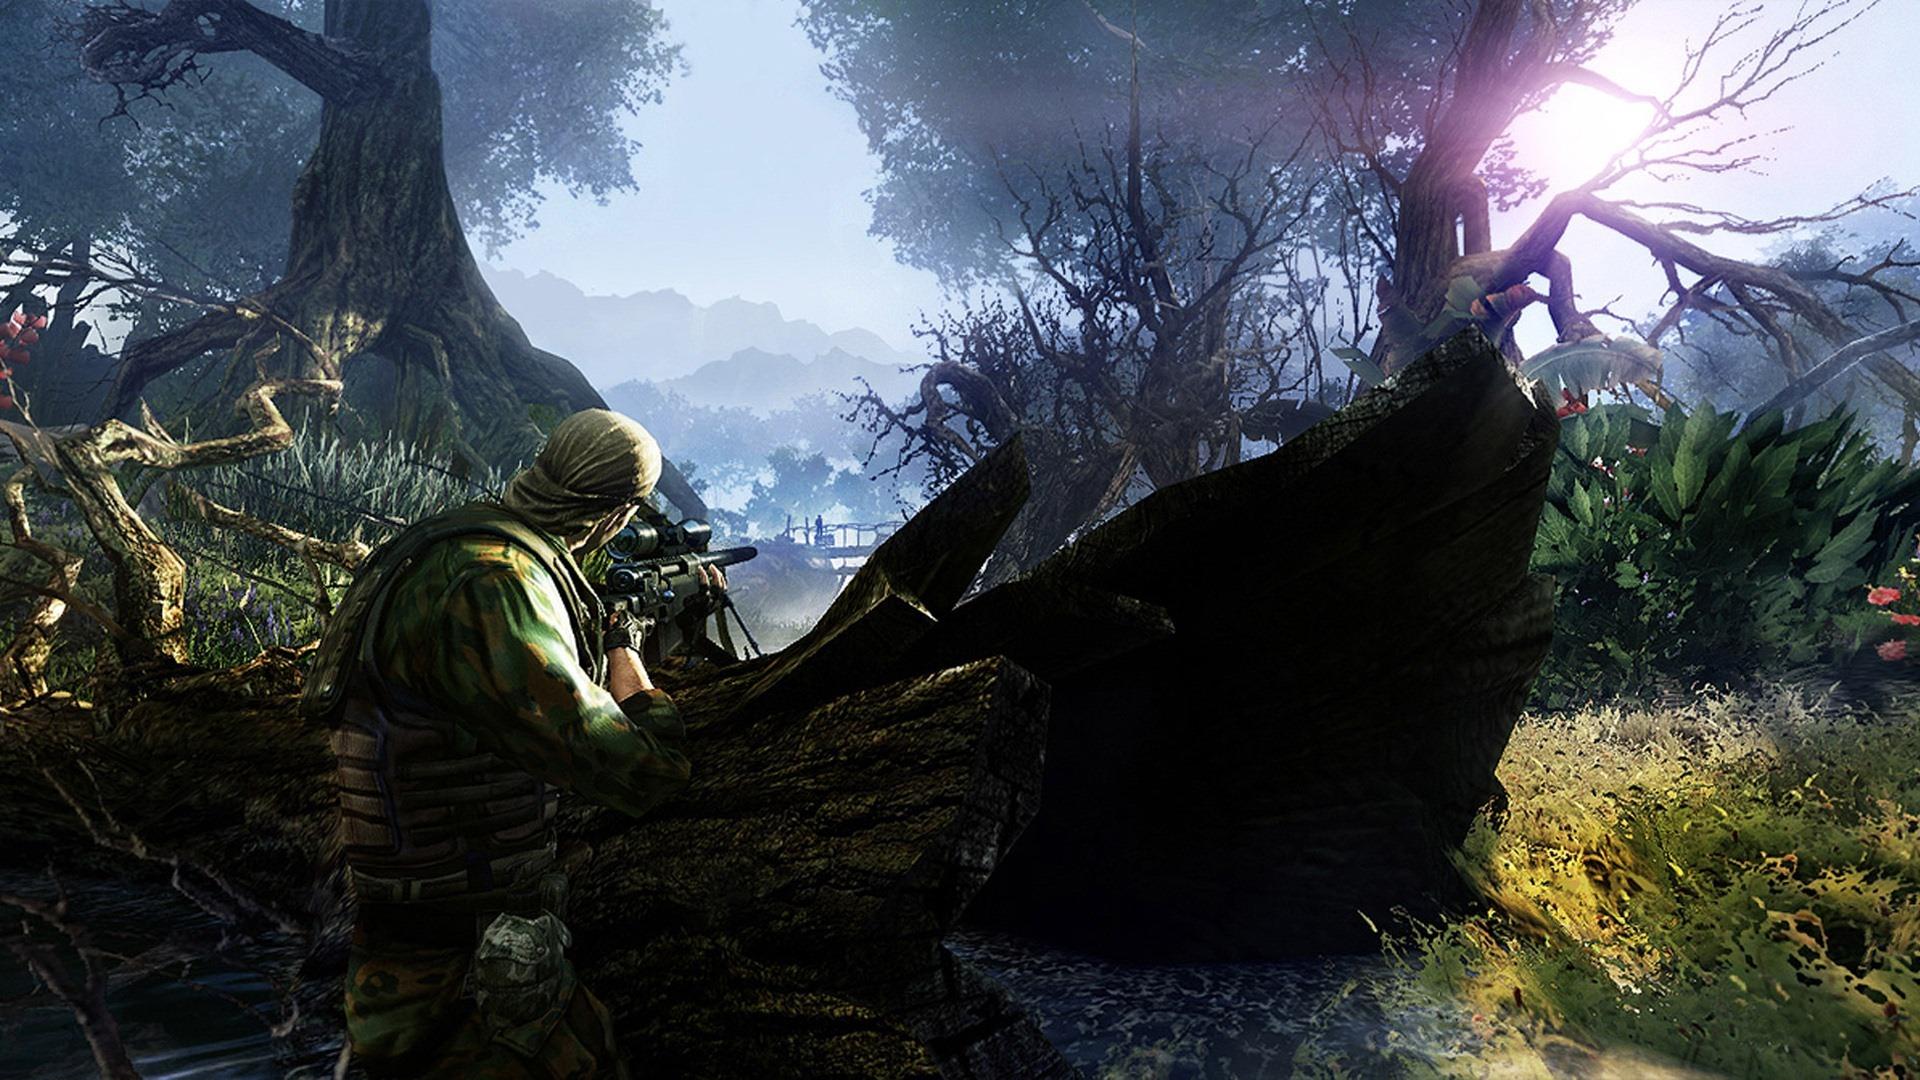 Sniper Ghost Warrior 2 Game Hd Wallpaper 03 Preview 10wallpaper Com